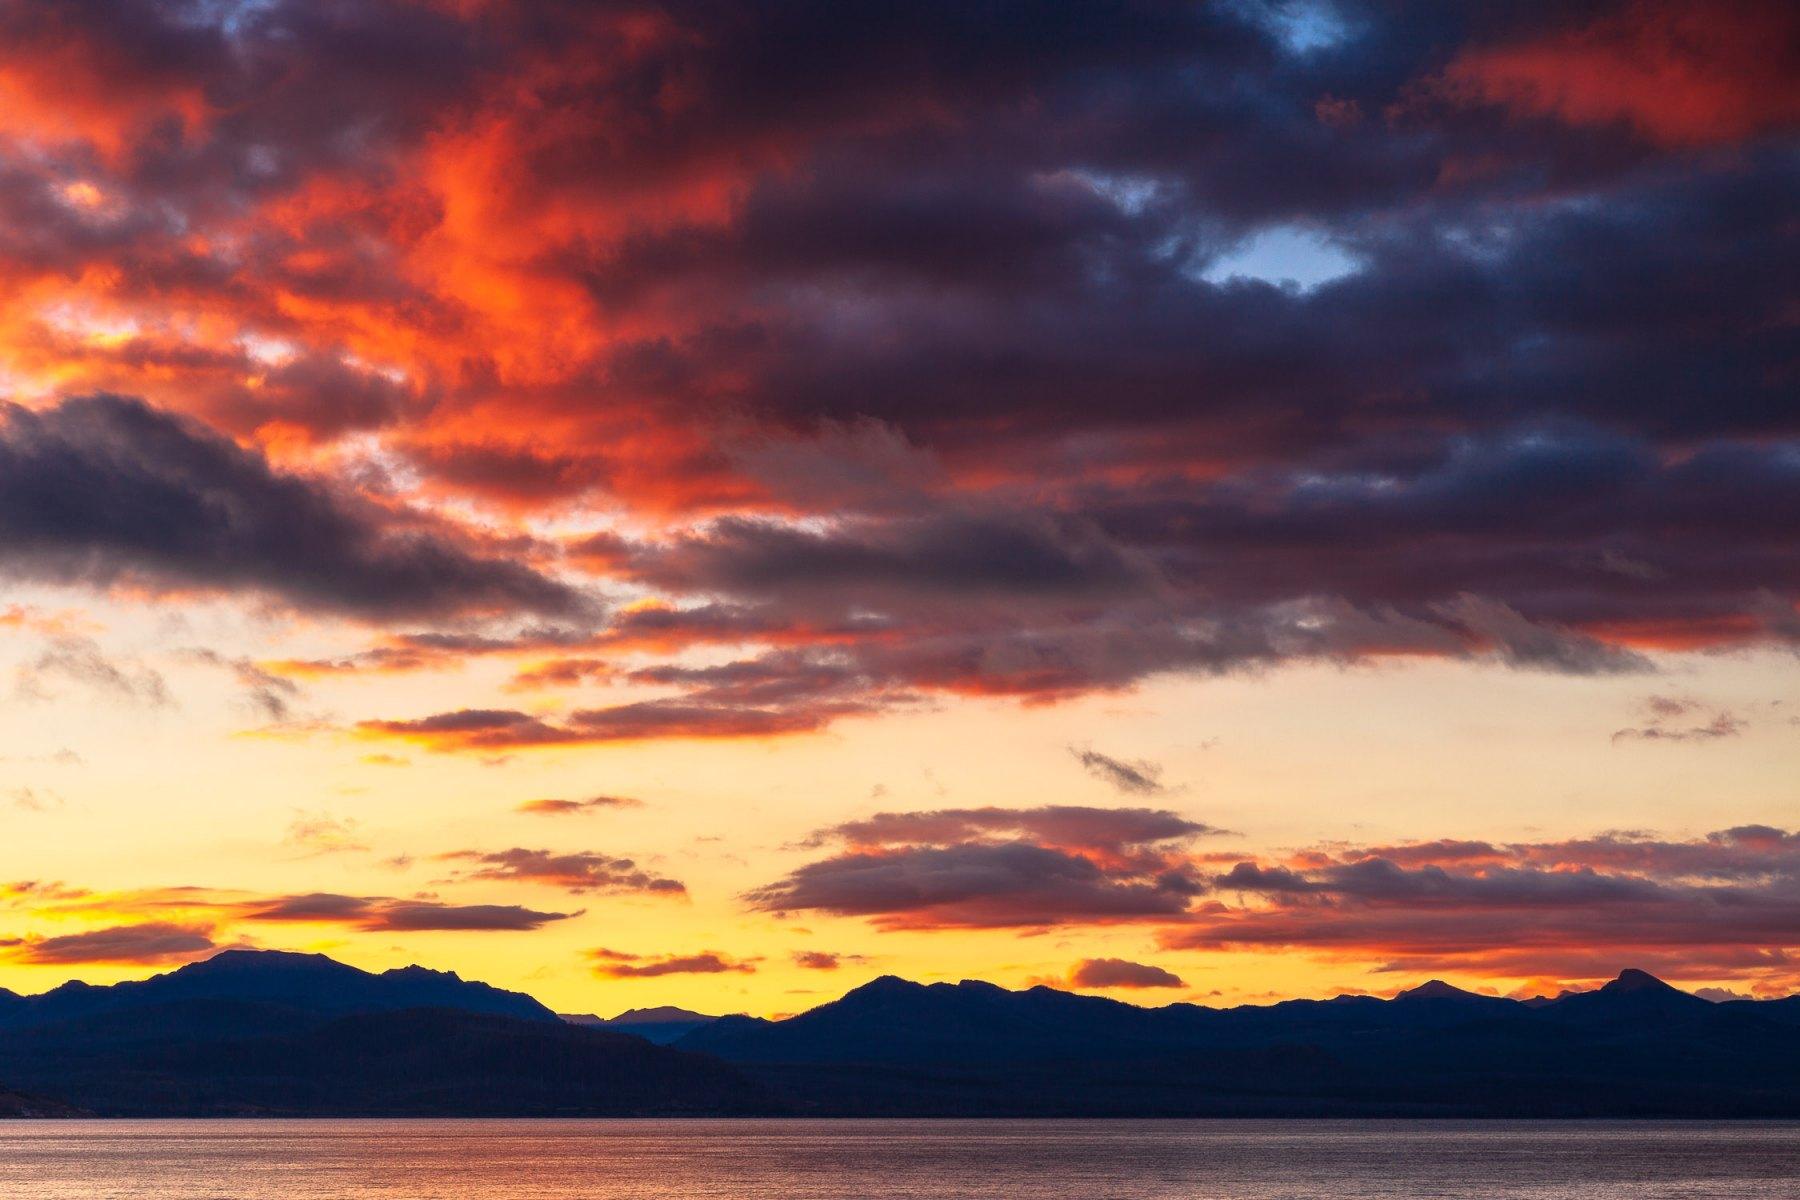 Sunrise over Yellowstone Lake